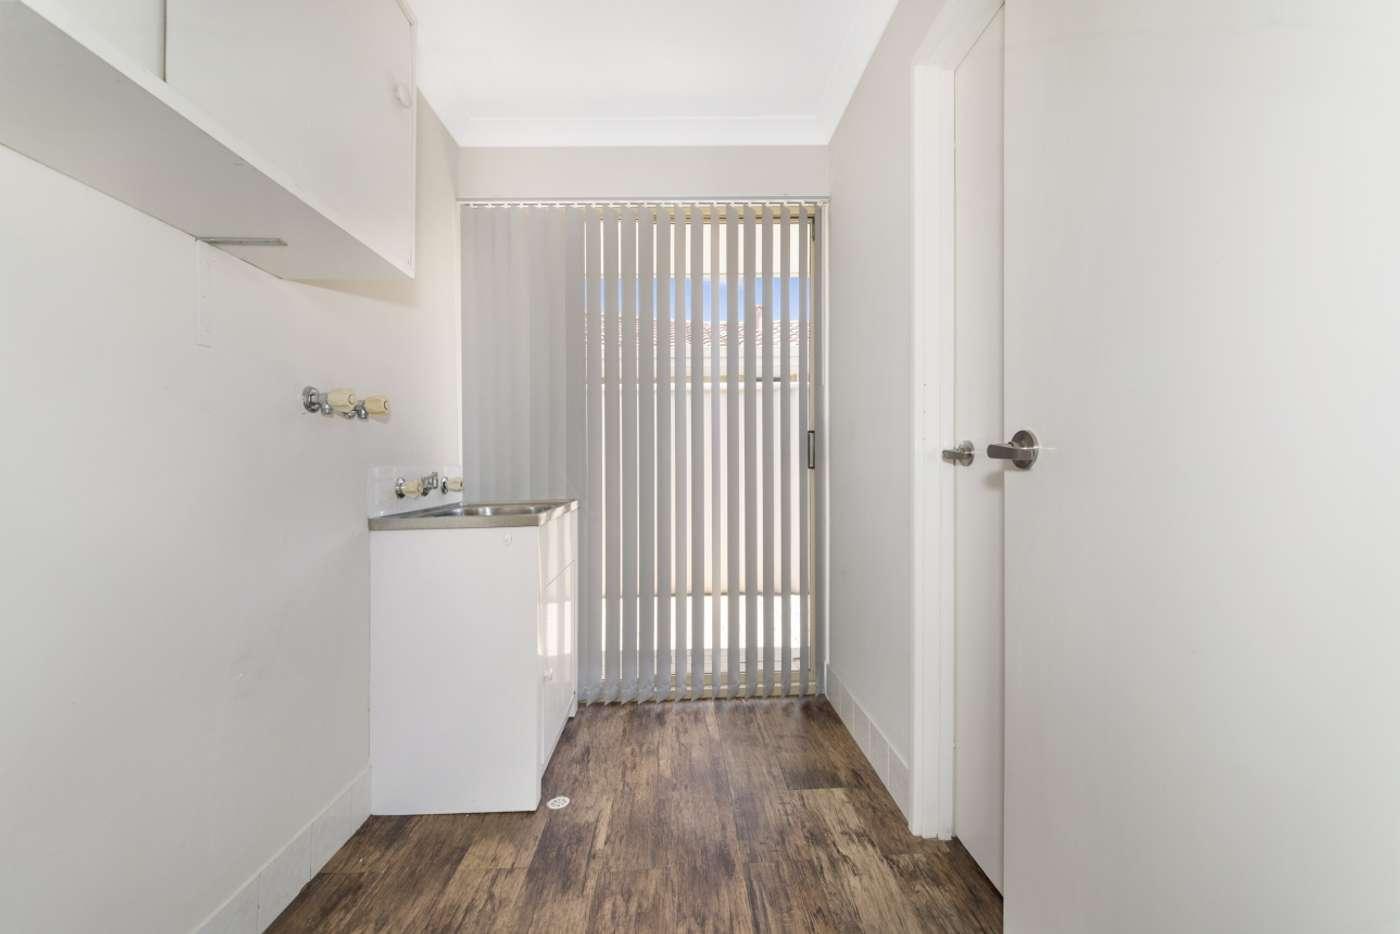 Sixth view of Homely unit listing, 8/6 Hawkins Street, Rockingham WA 6168